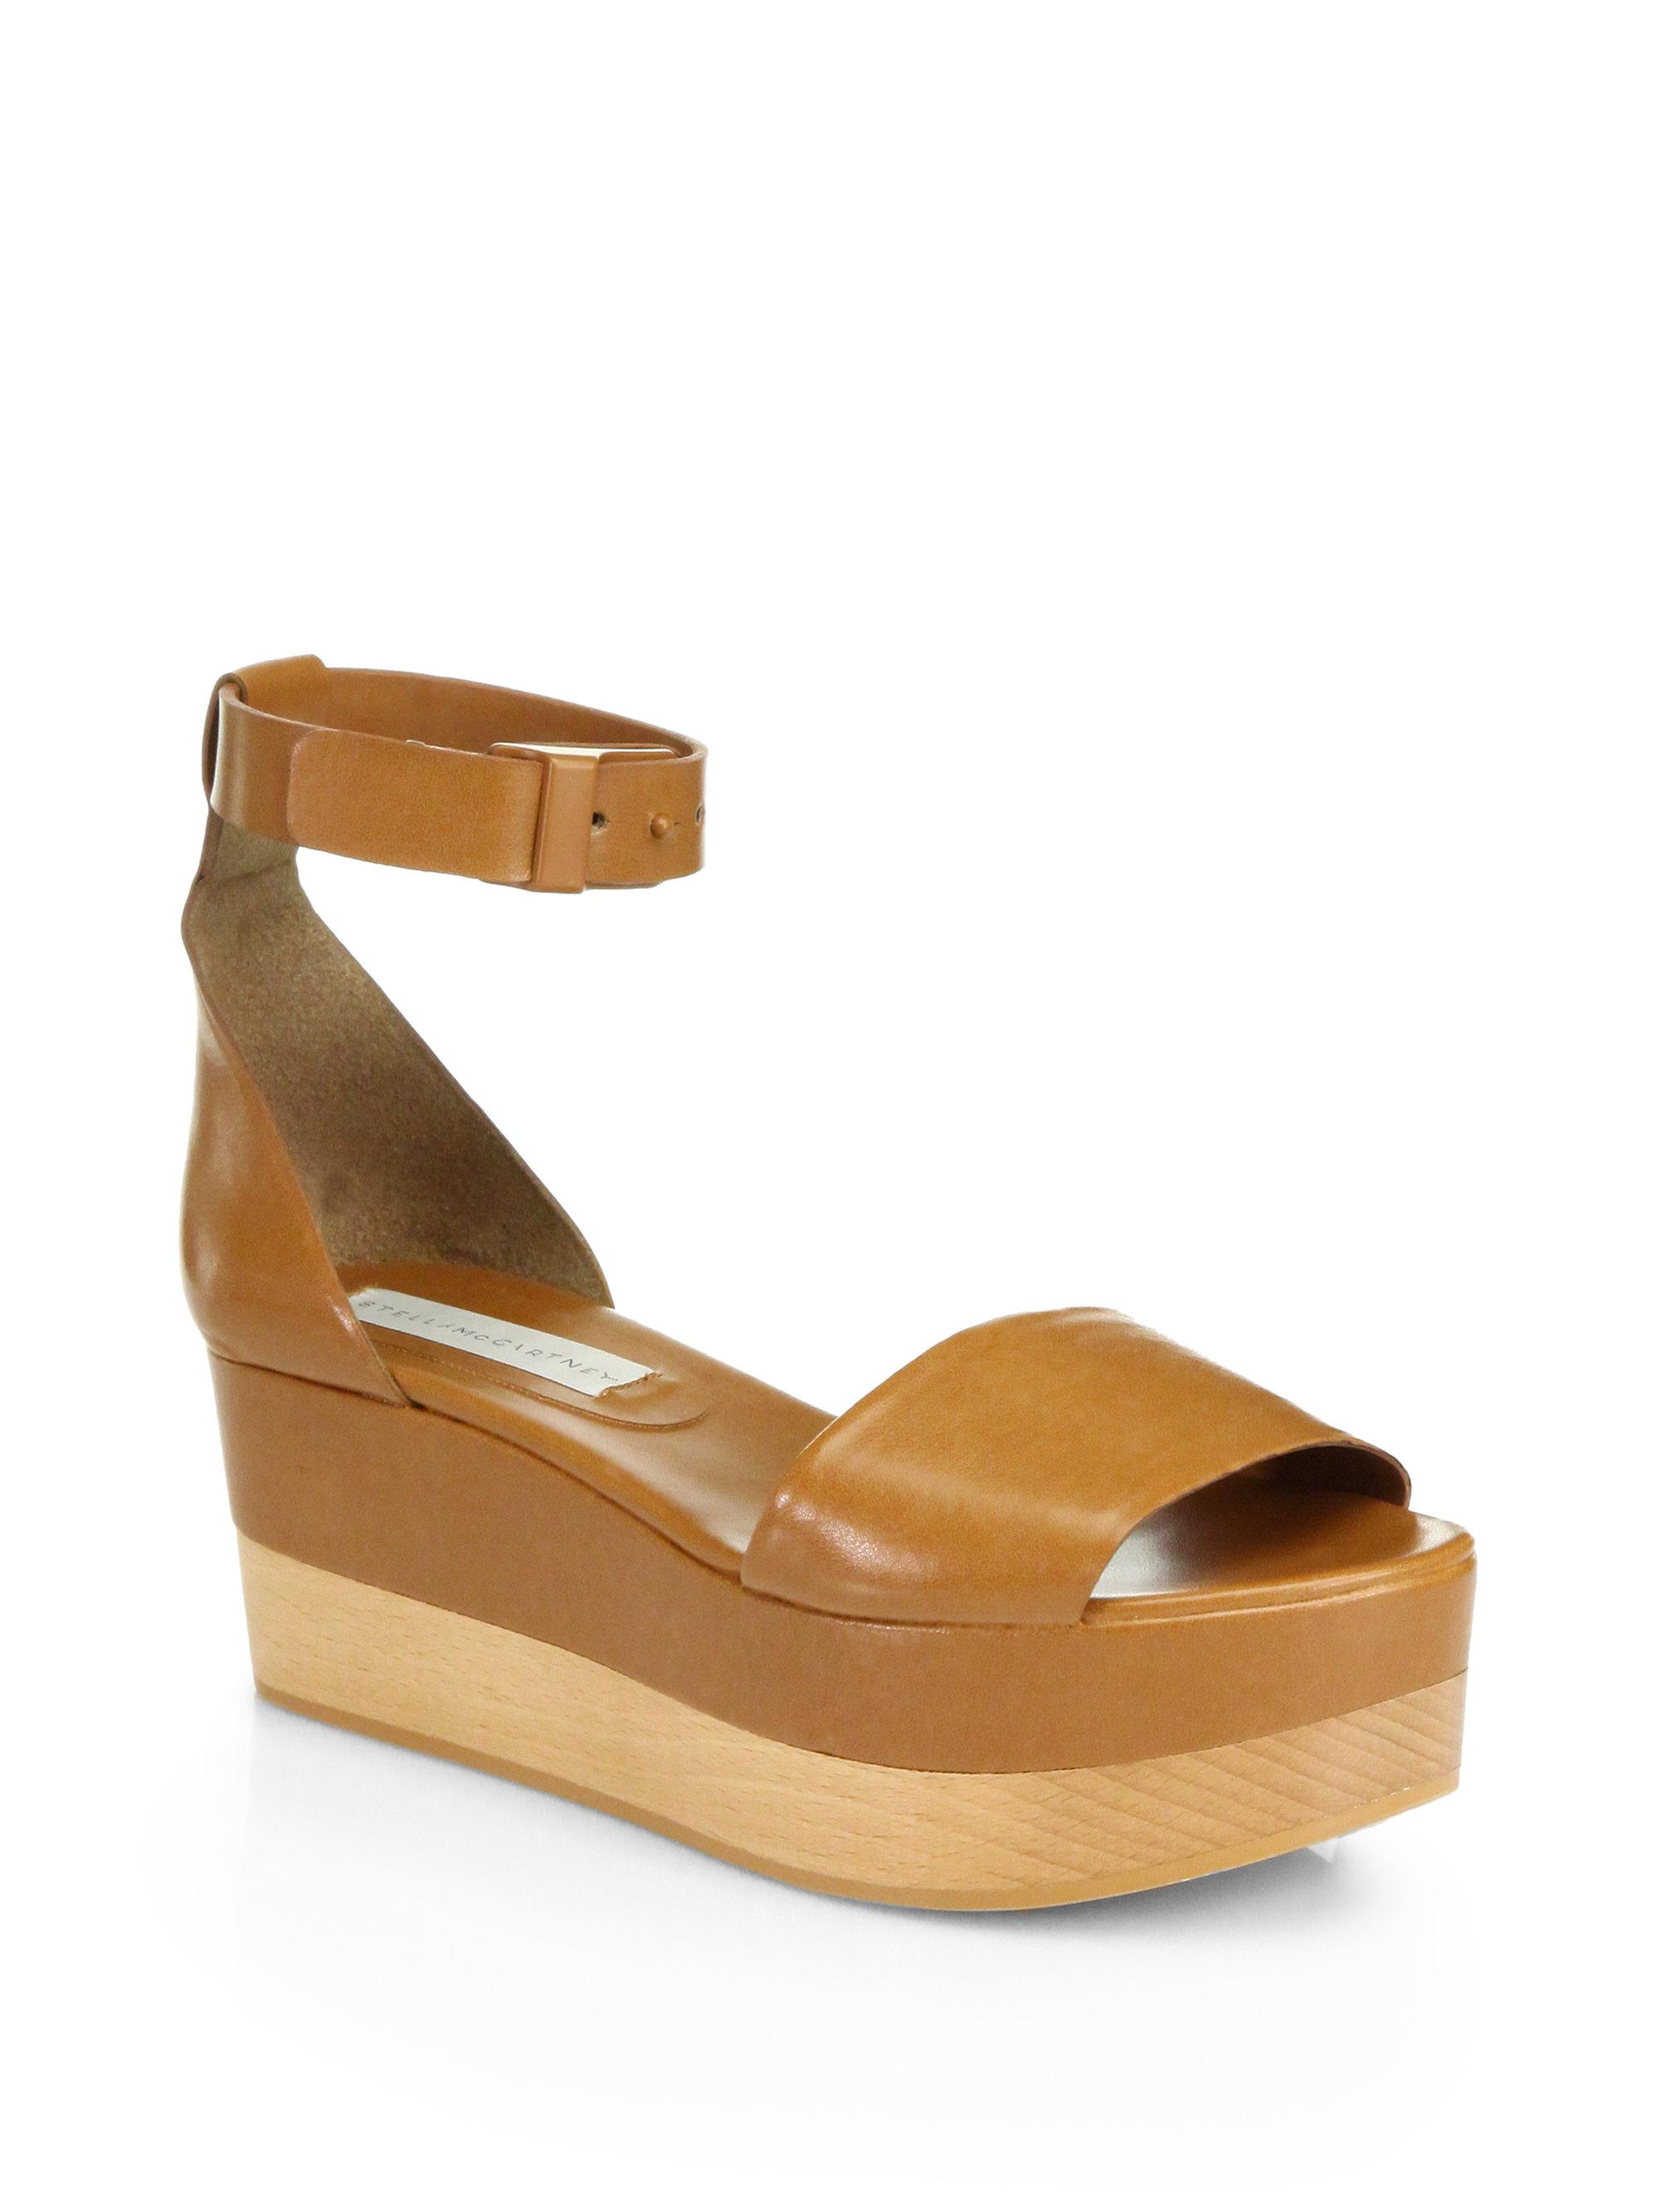 outlet sale online Stella McCartney Platform Ankle Strap Sandals buy cheap how much SntdgCj8